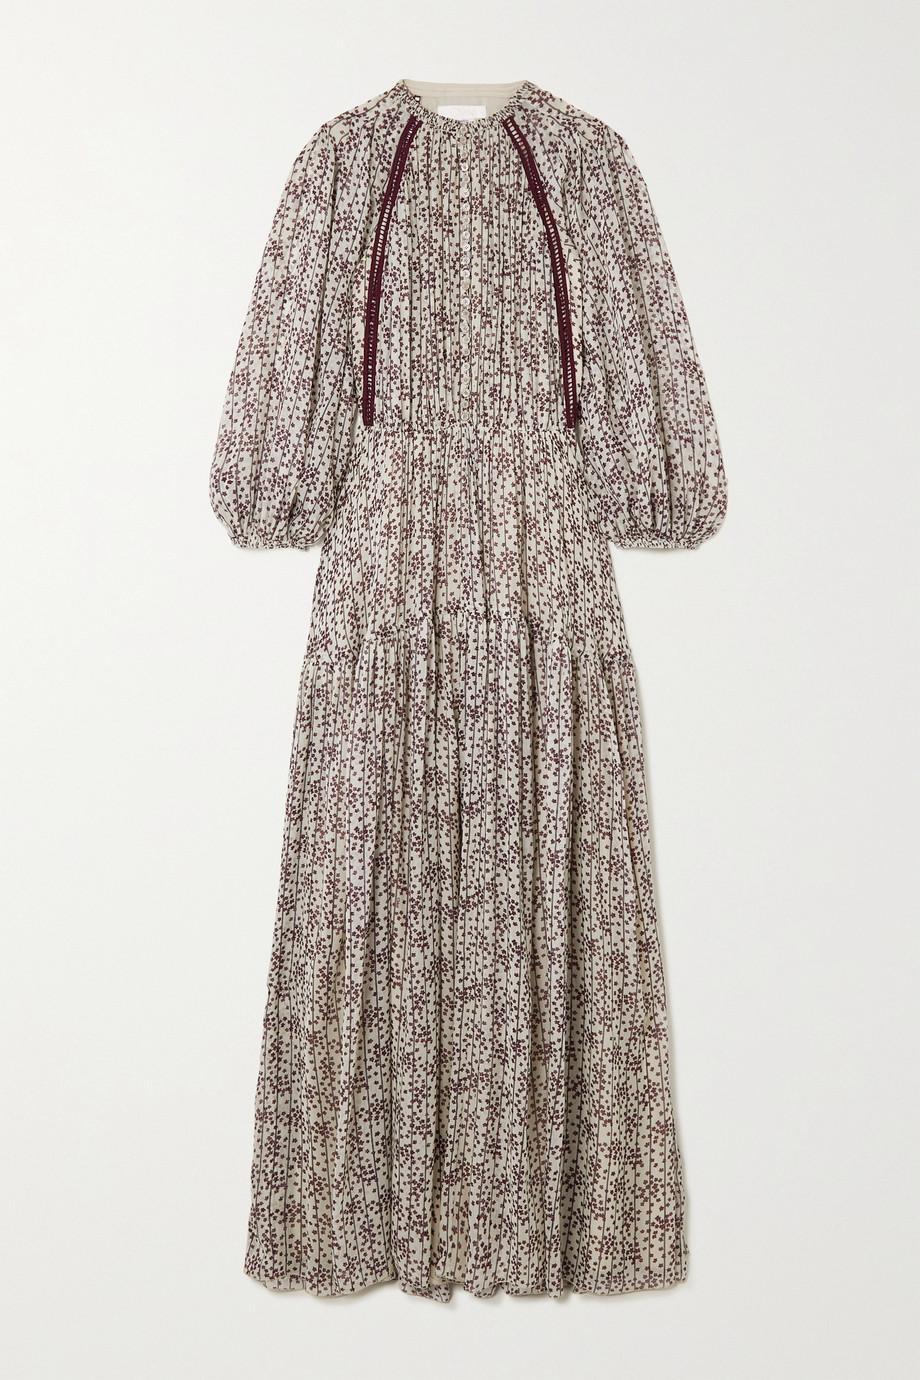 Chloé Pleated floral-print silk-georgette maxi dress